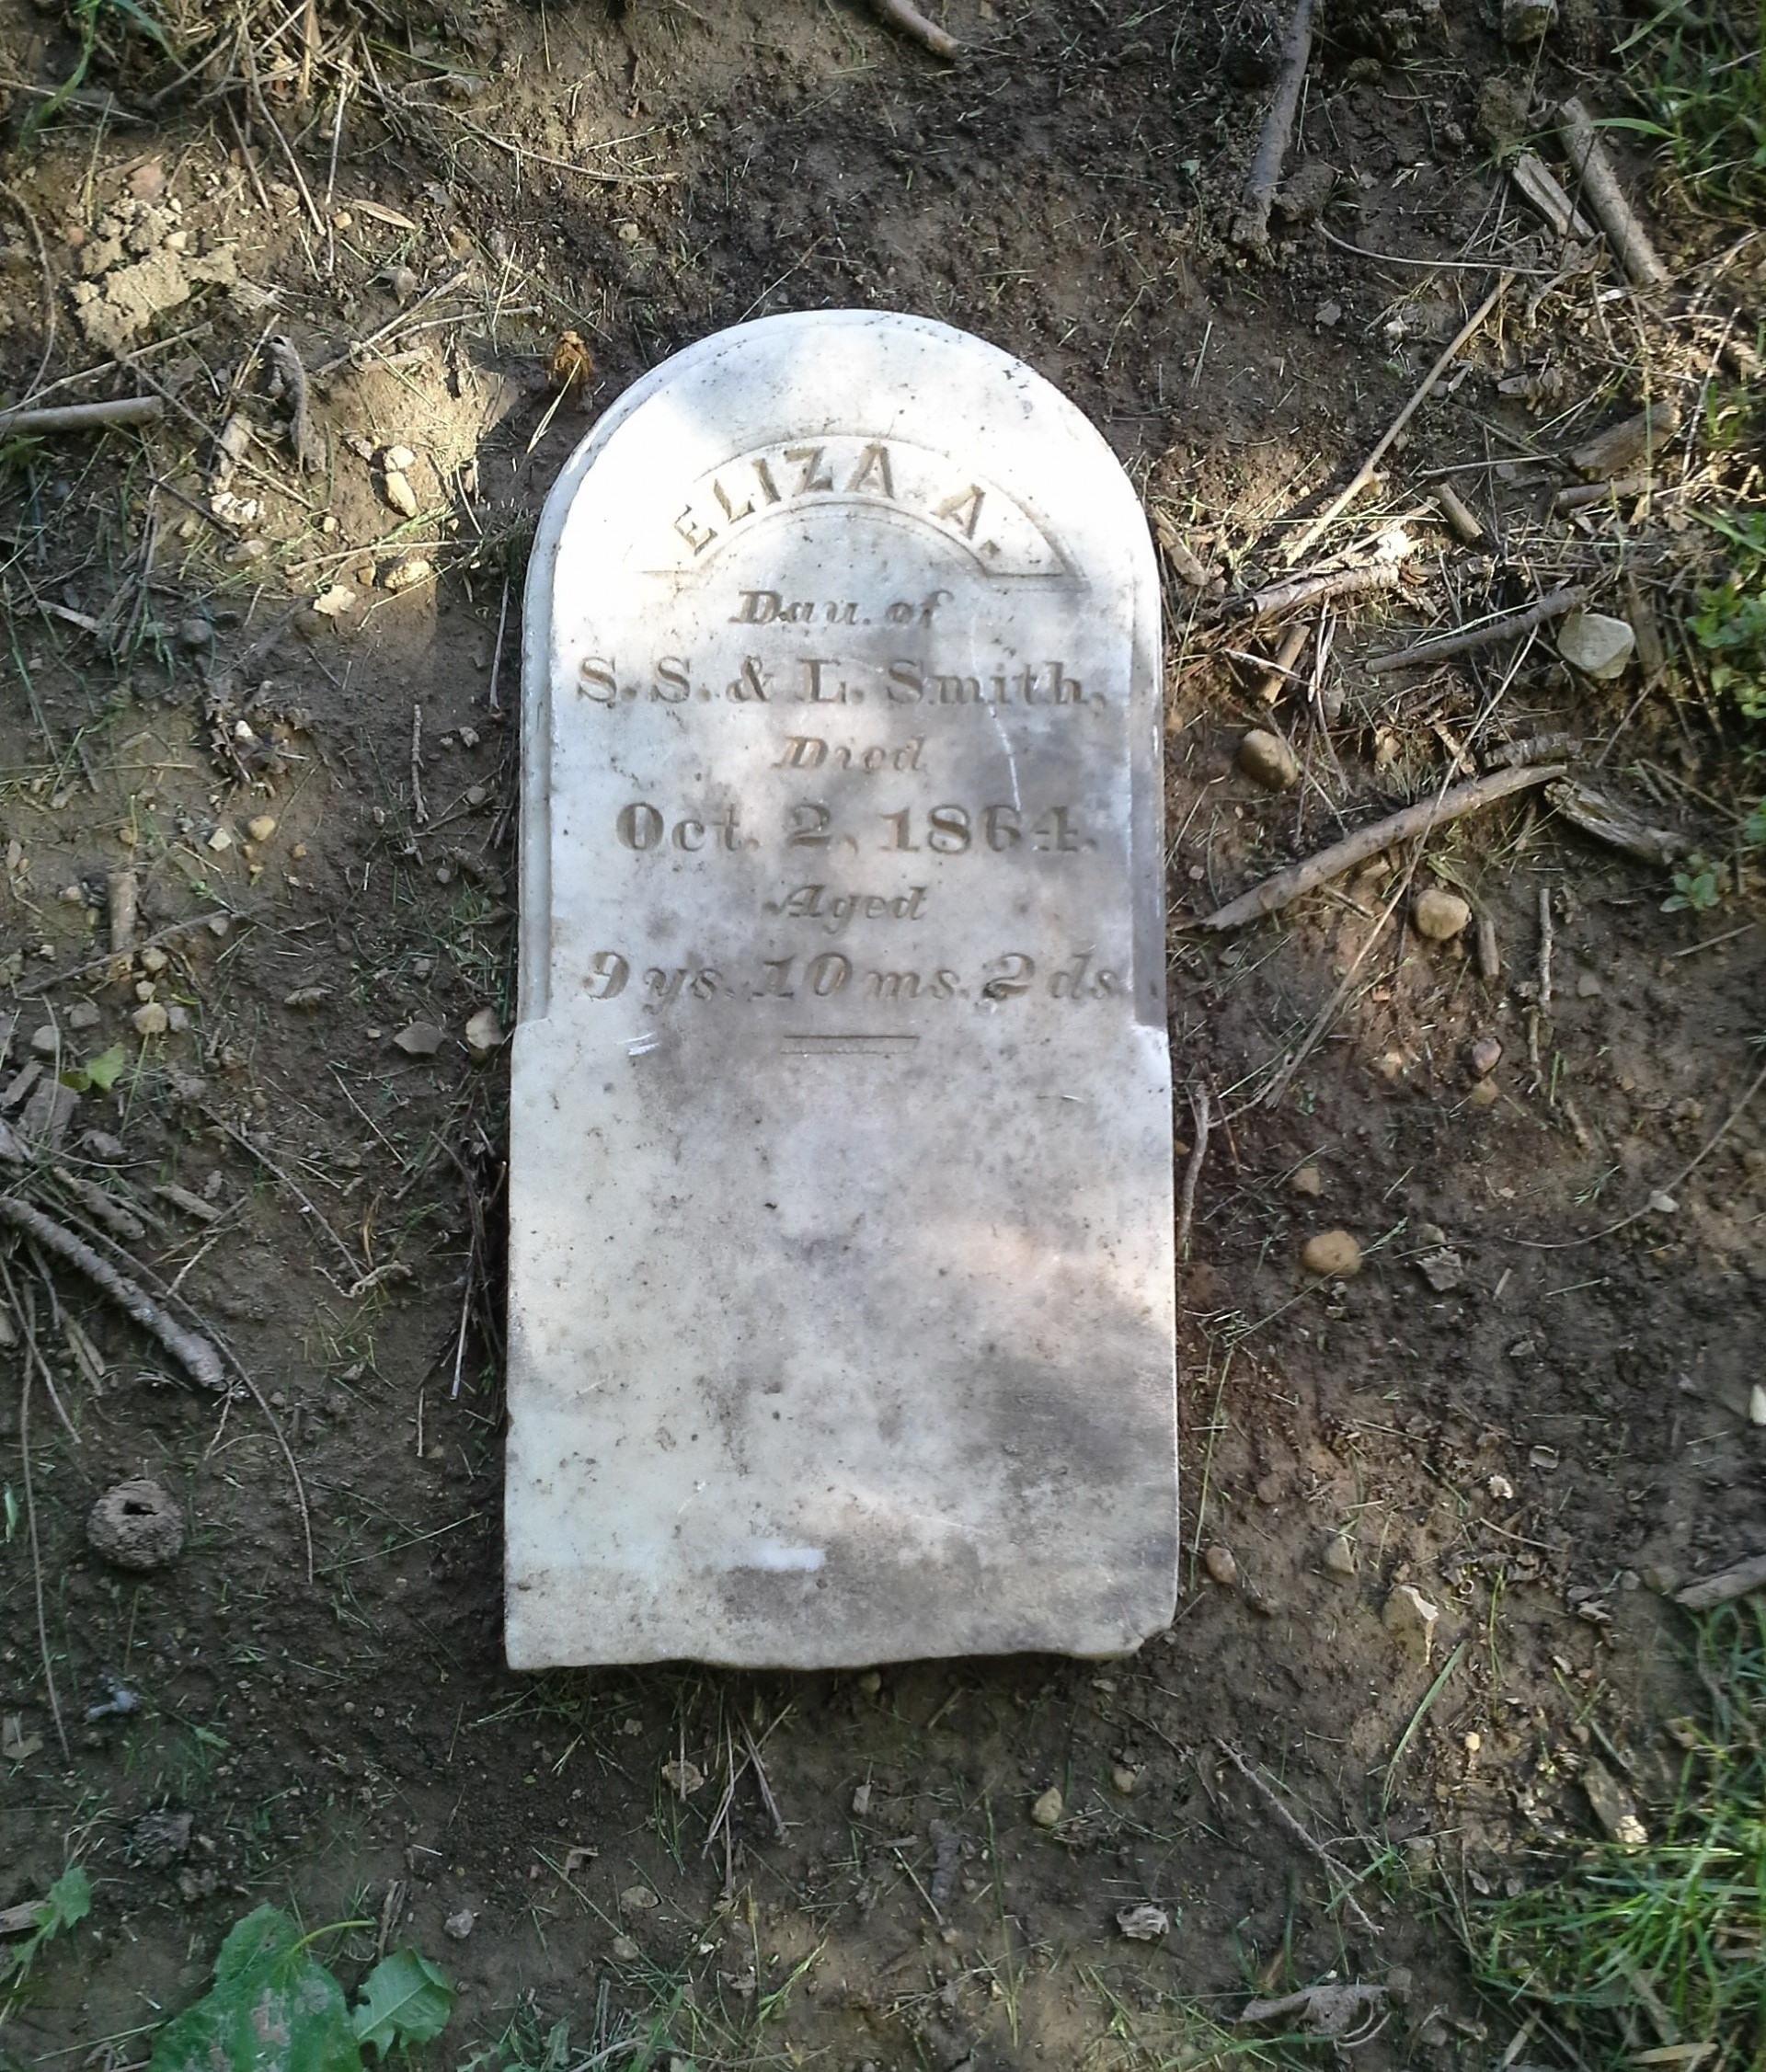 Eliza A Smith